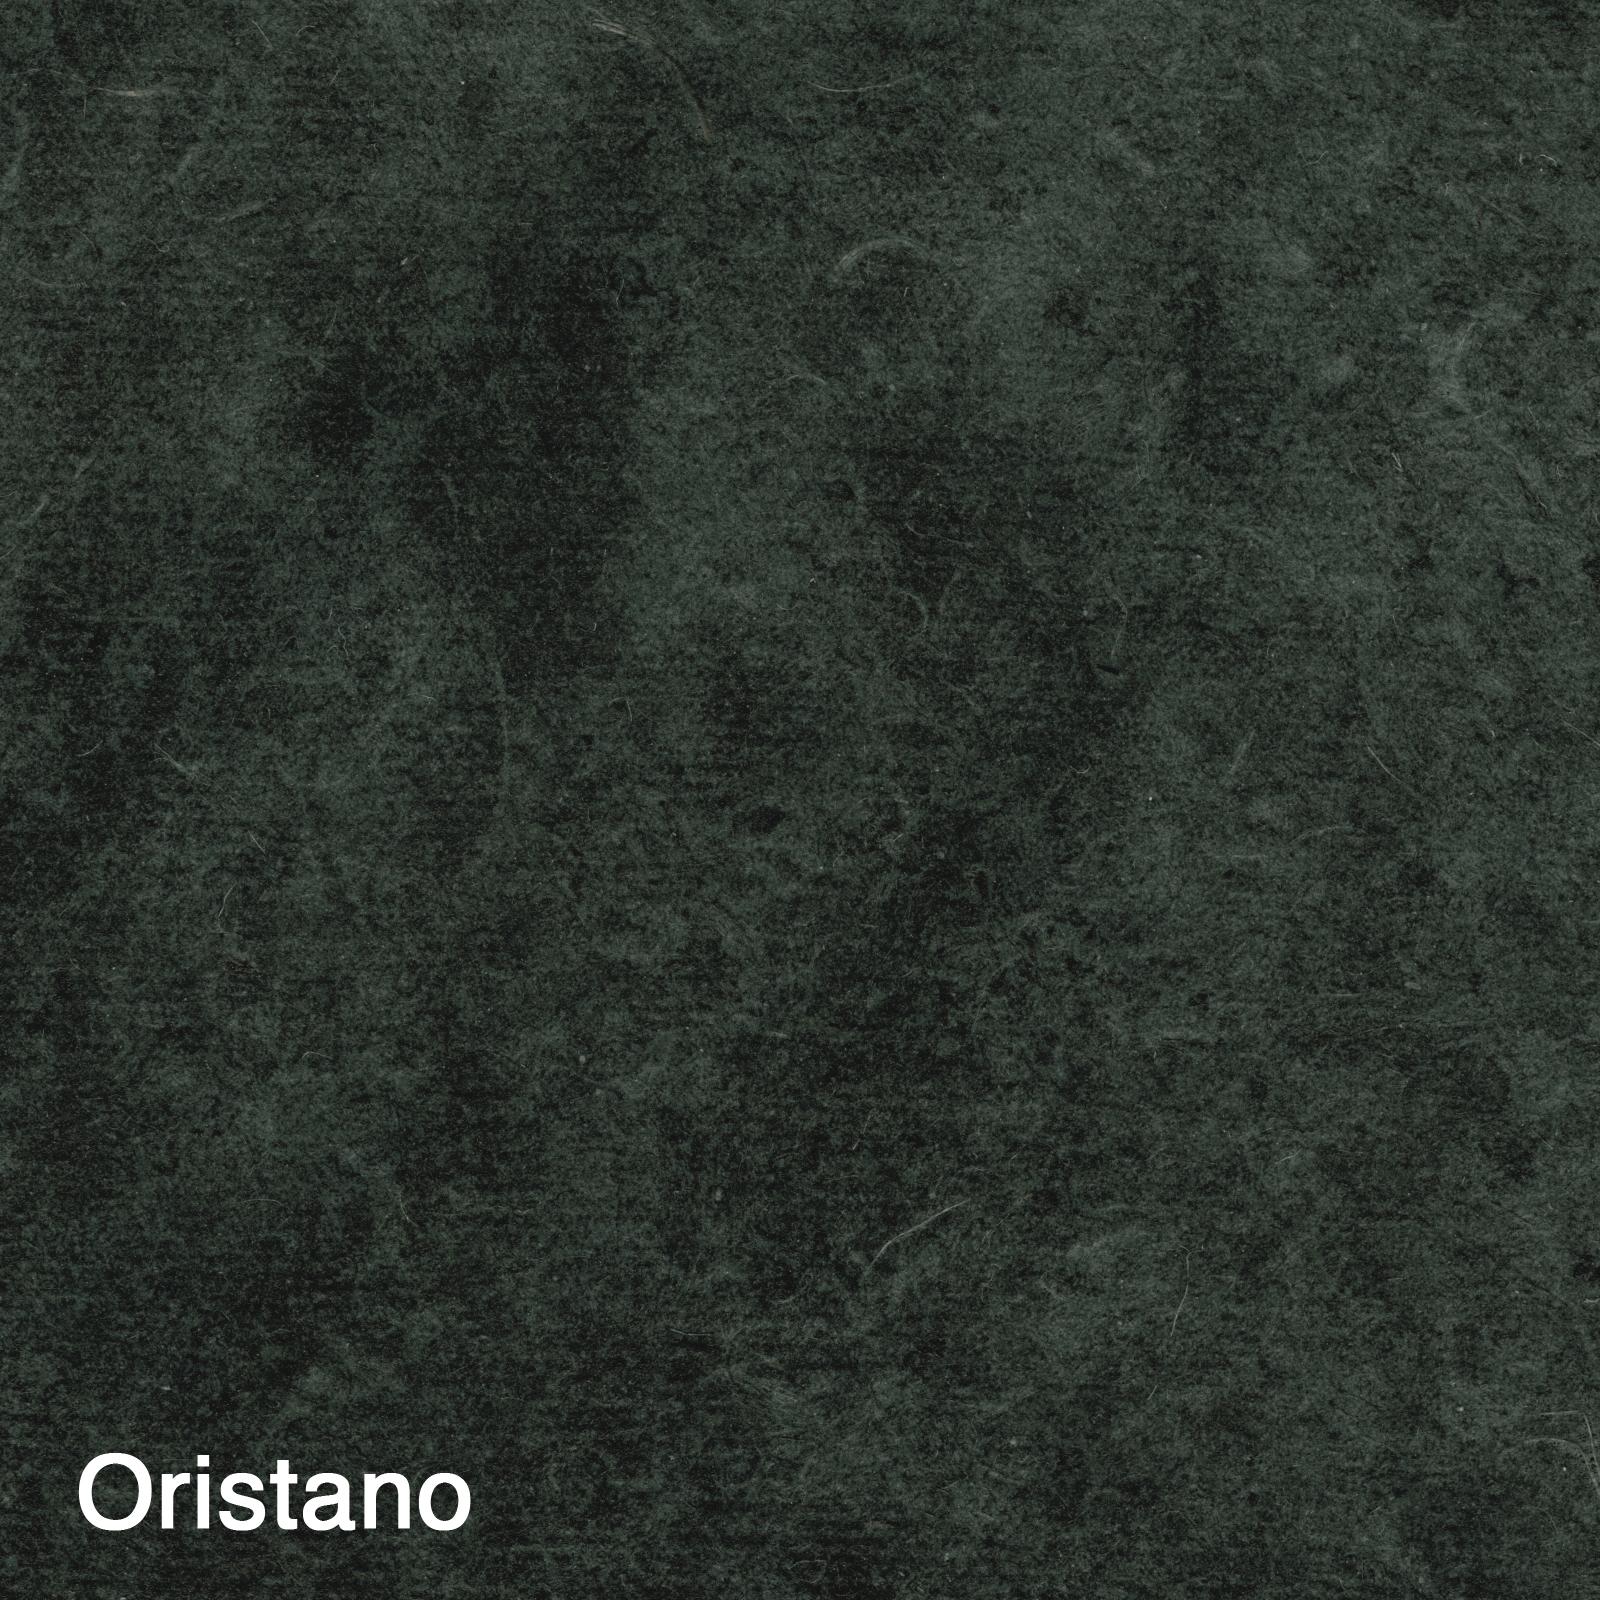 Oristano.jpg